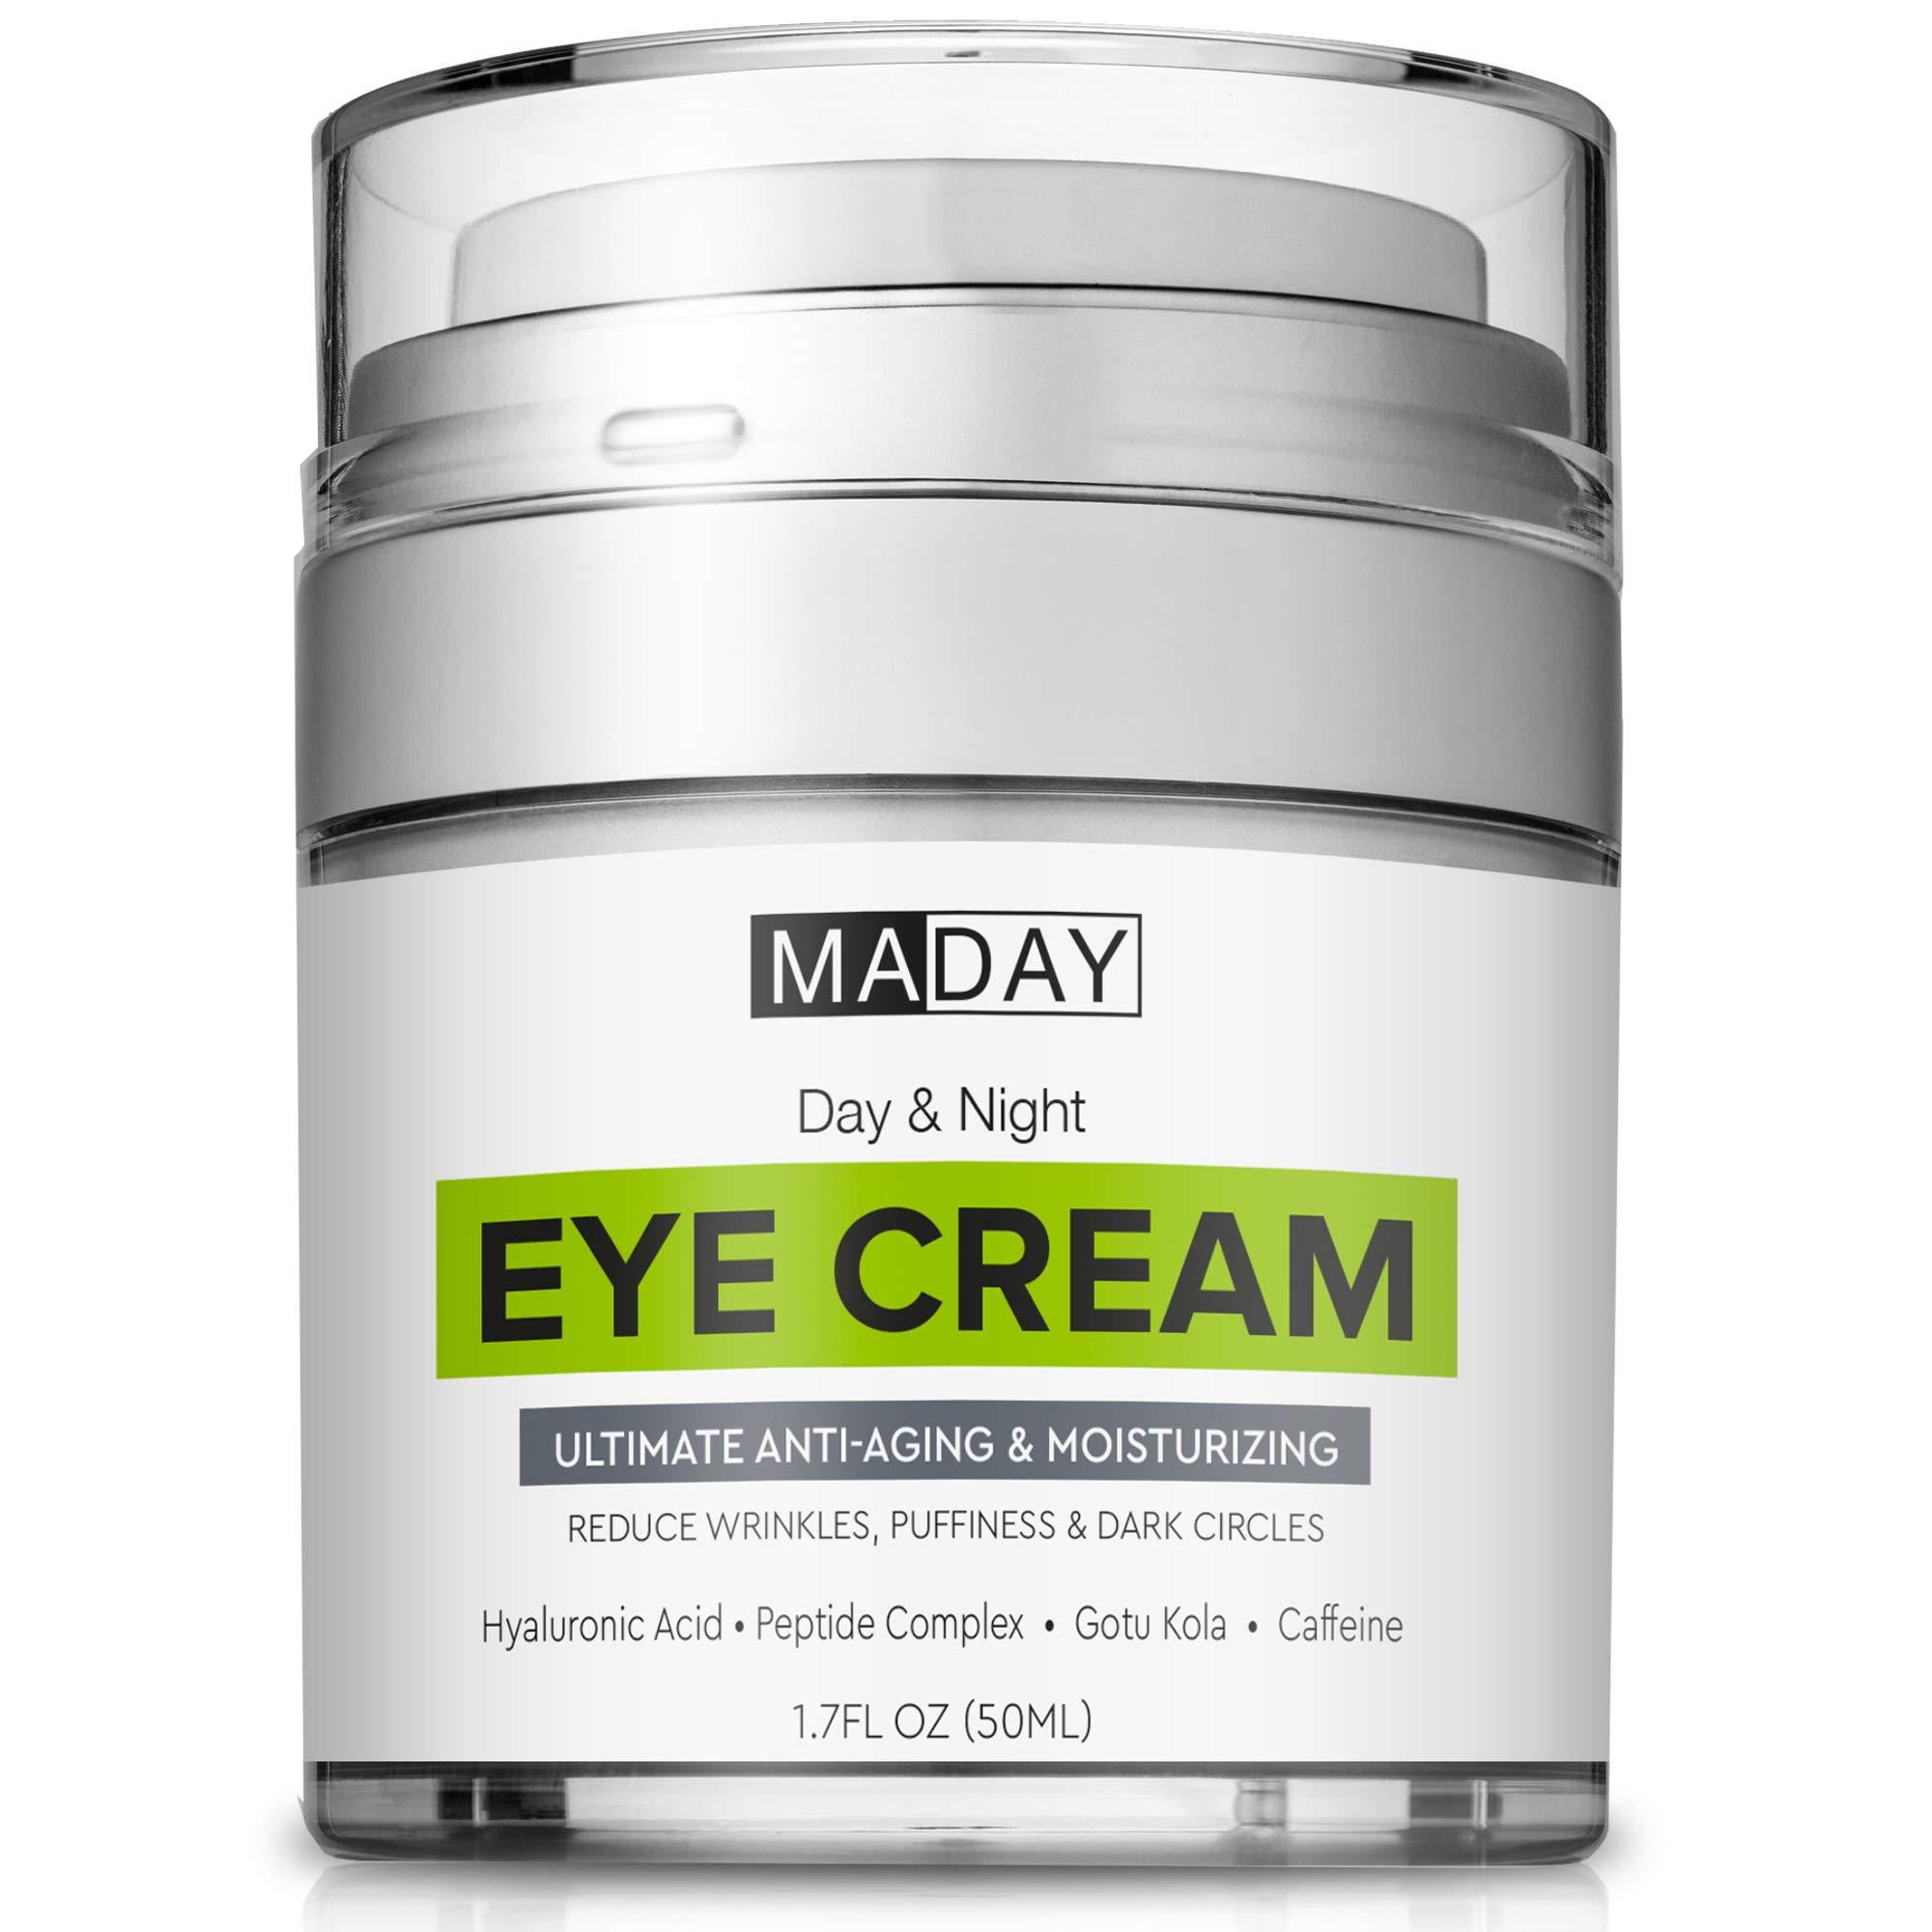 Eye Cream - Reduce Dark Circles, Puffiness & Under Eye Bags - Effective Anti-Wrinkles Treatment - Anti-Aging Eye Gel with Hyaluronic Acid, Gotu Kola Extract, Caffeine - Refreshing Eye Serum by MadayFormula